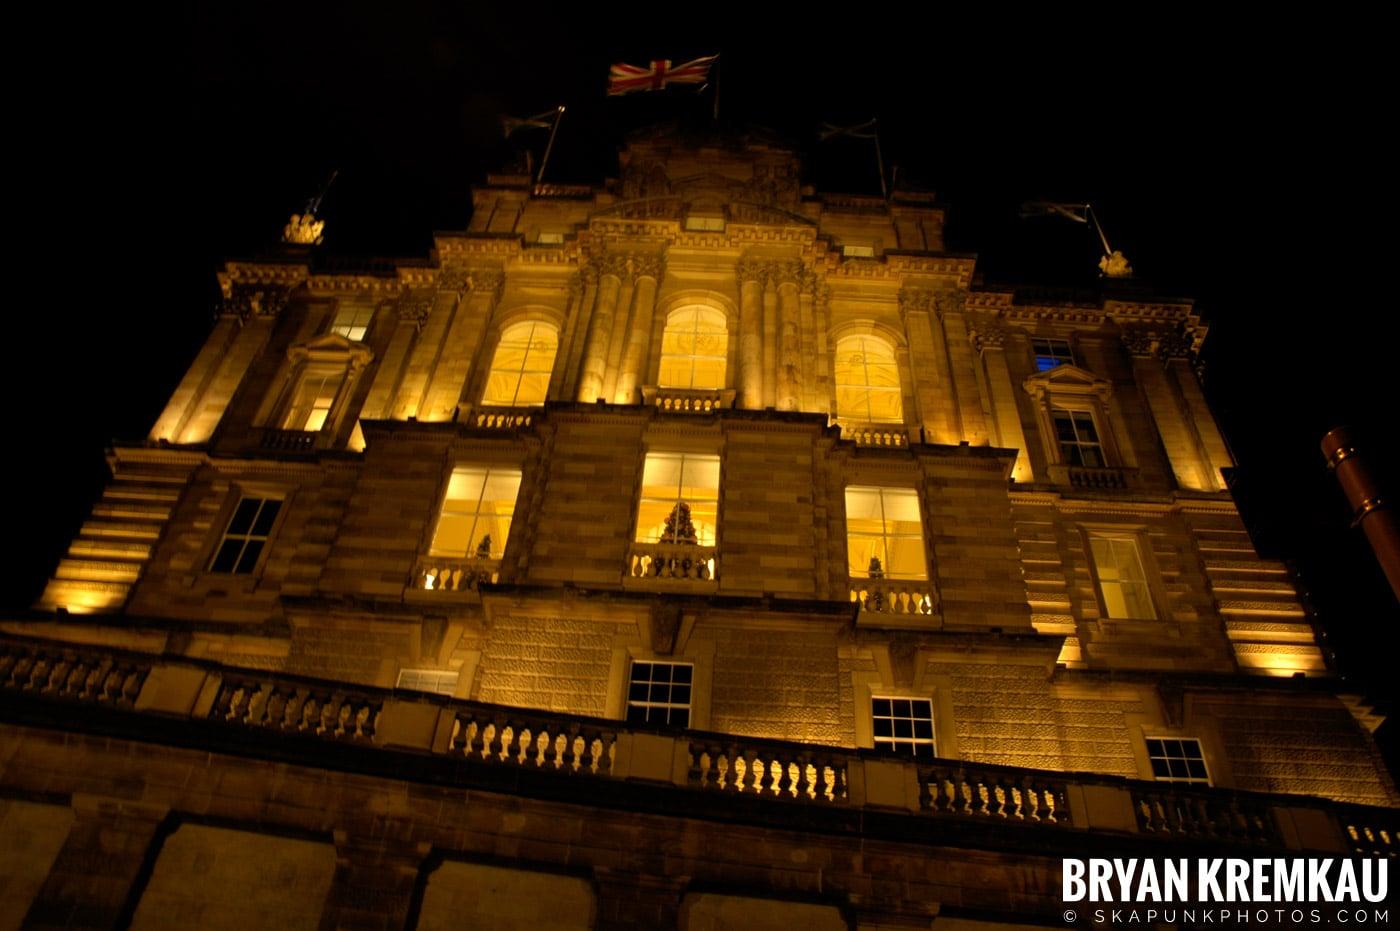 Edinburgh, Scotland - Day 1 - 12.12.06 (12)